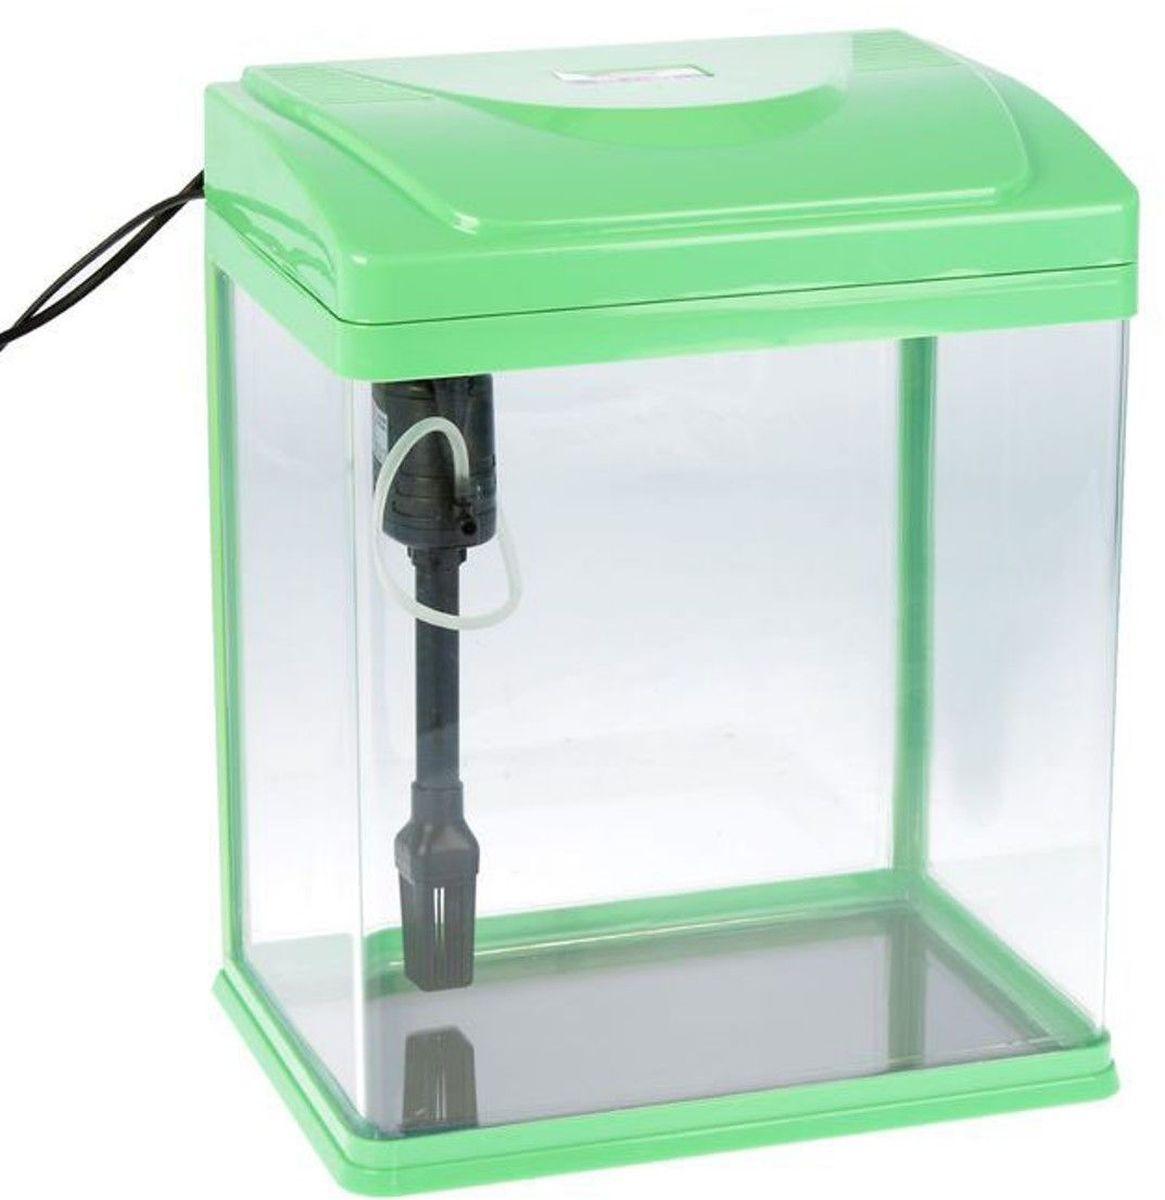 Аквариум Sea Star  HX-320ZF , цвет: зеленый, прозрачный, 28 л